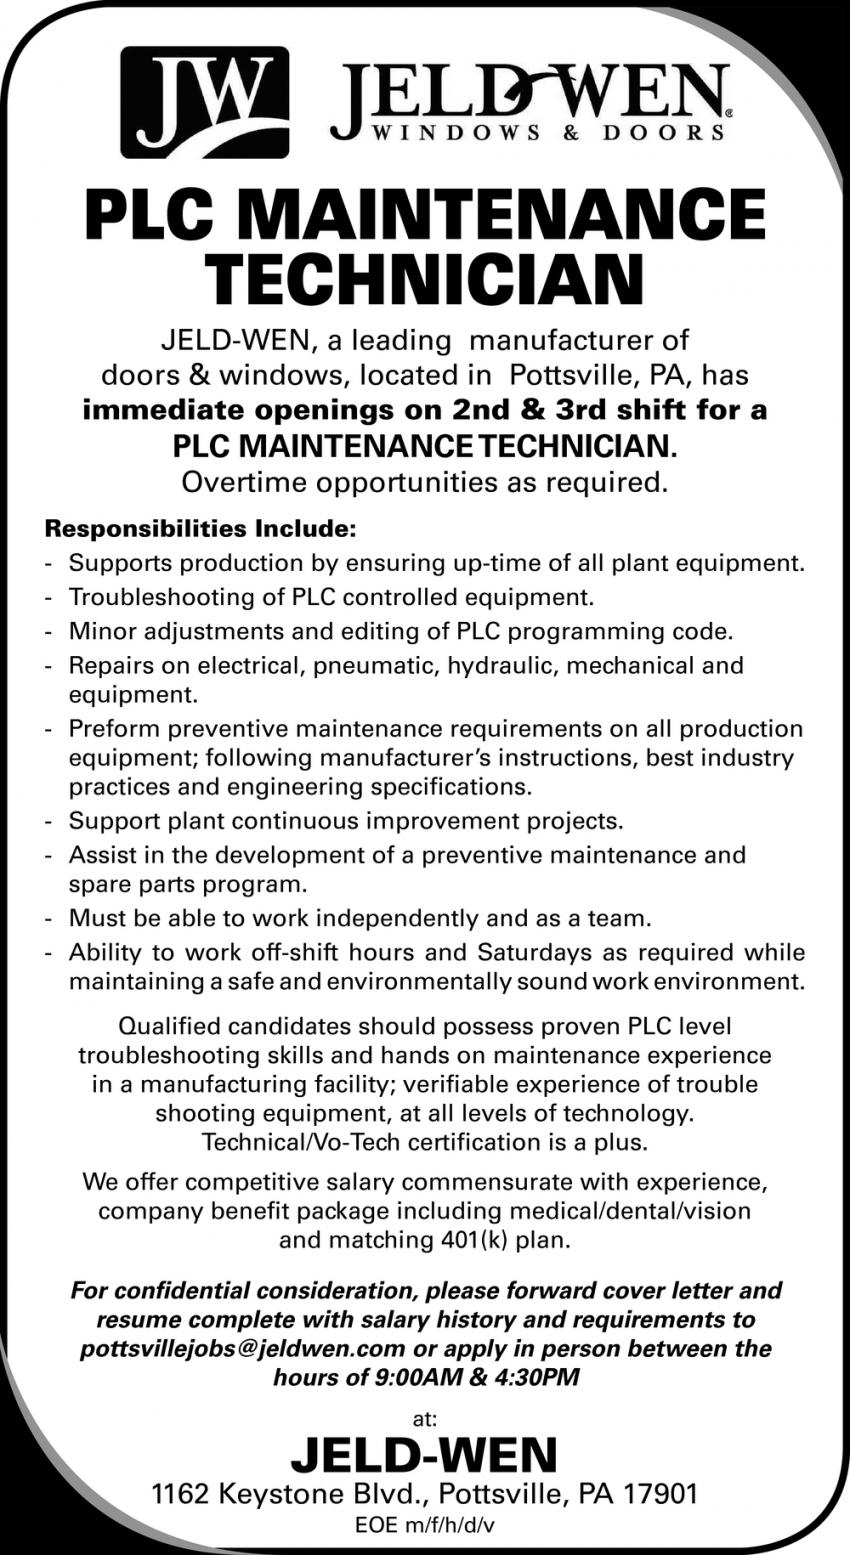 PLC Maintnance Technician